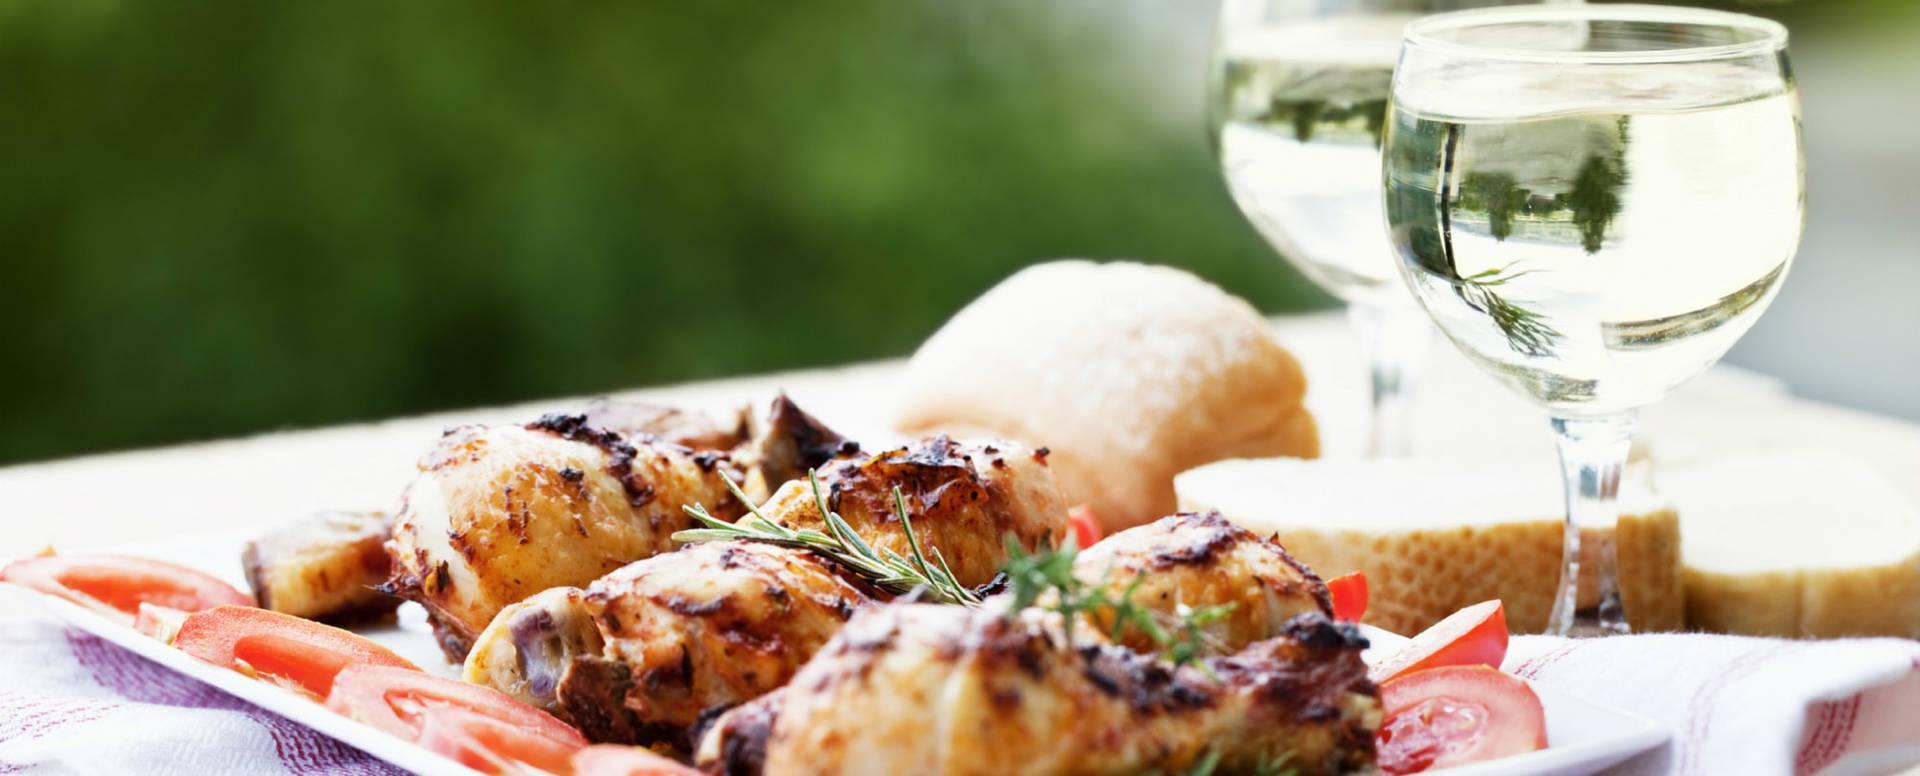 Enjoy a meal at Hotel Het Witte Veen